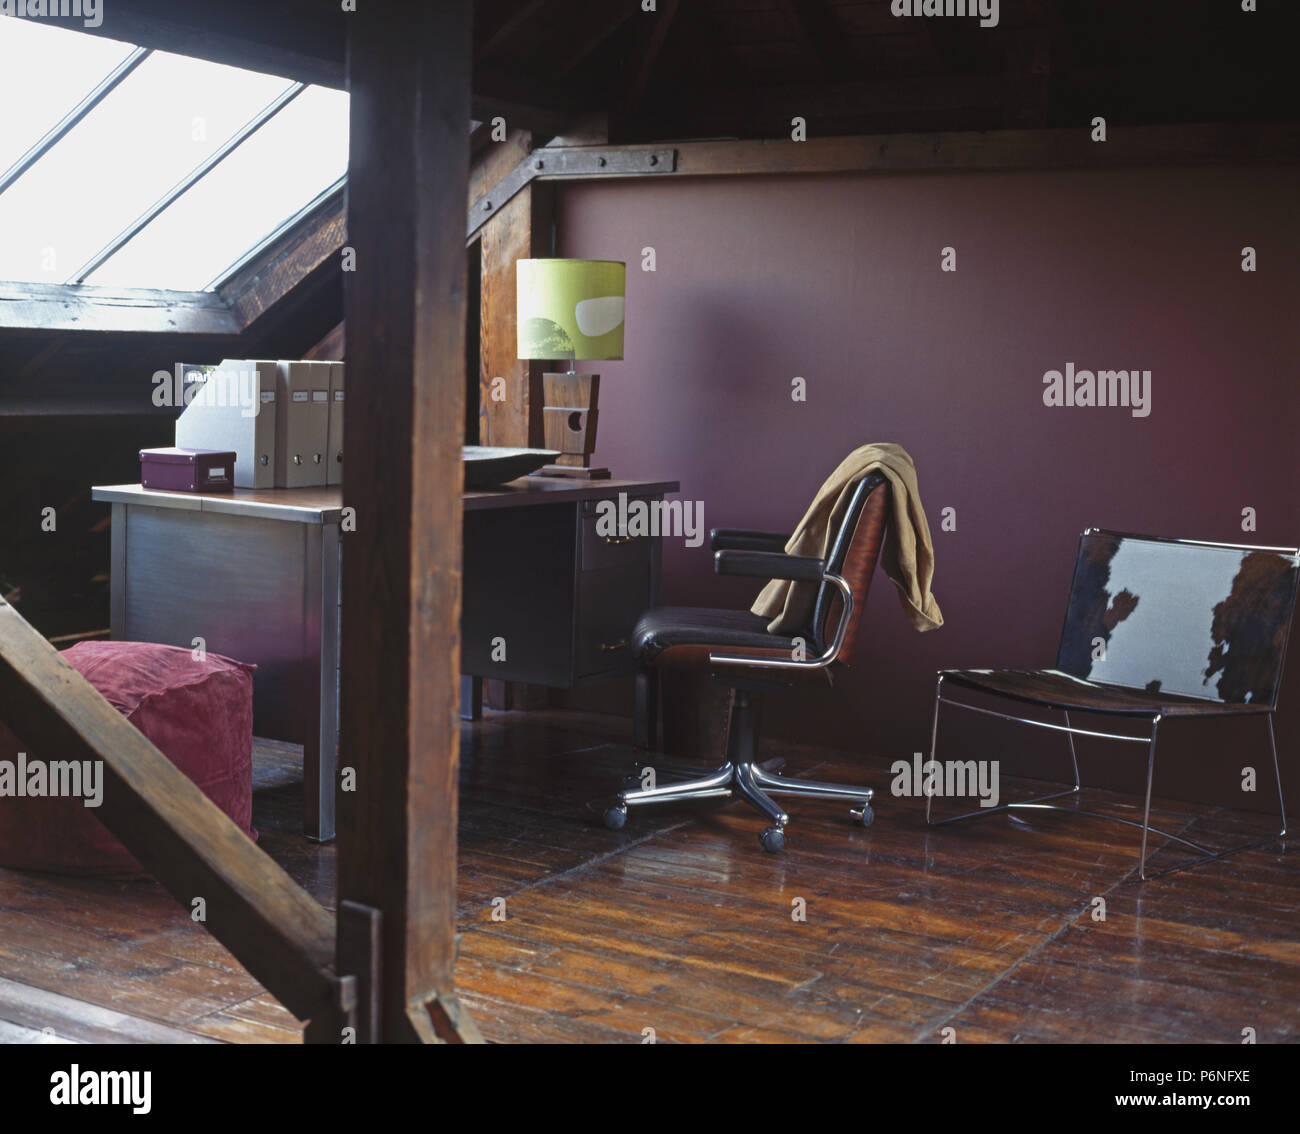 Ponyskin Cushion On Leather Chair In Purple Loft Conversion Study